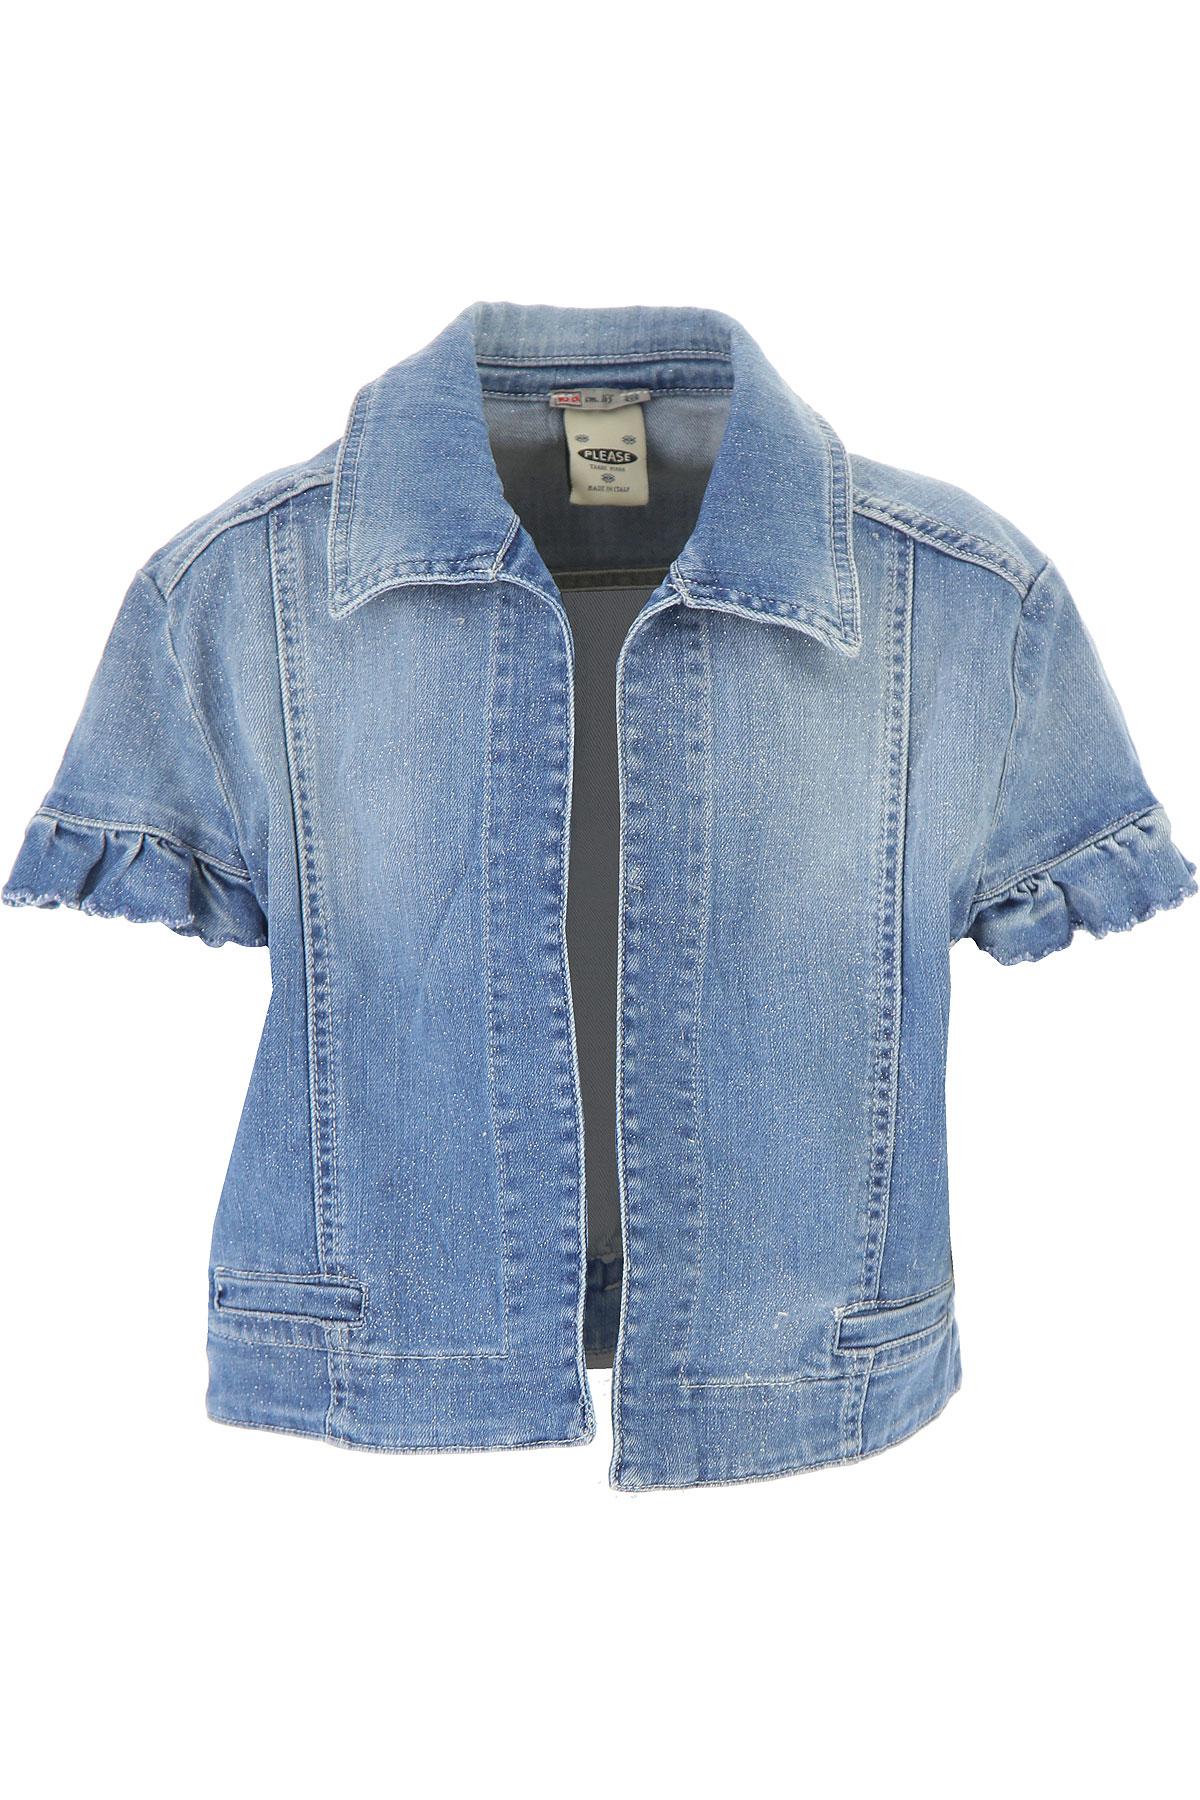 Image of Please Kids Jacket for Girls On Sale, Blue Denim, Cotton, 2017, 14Y 16Y